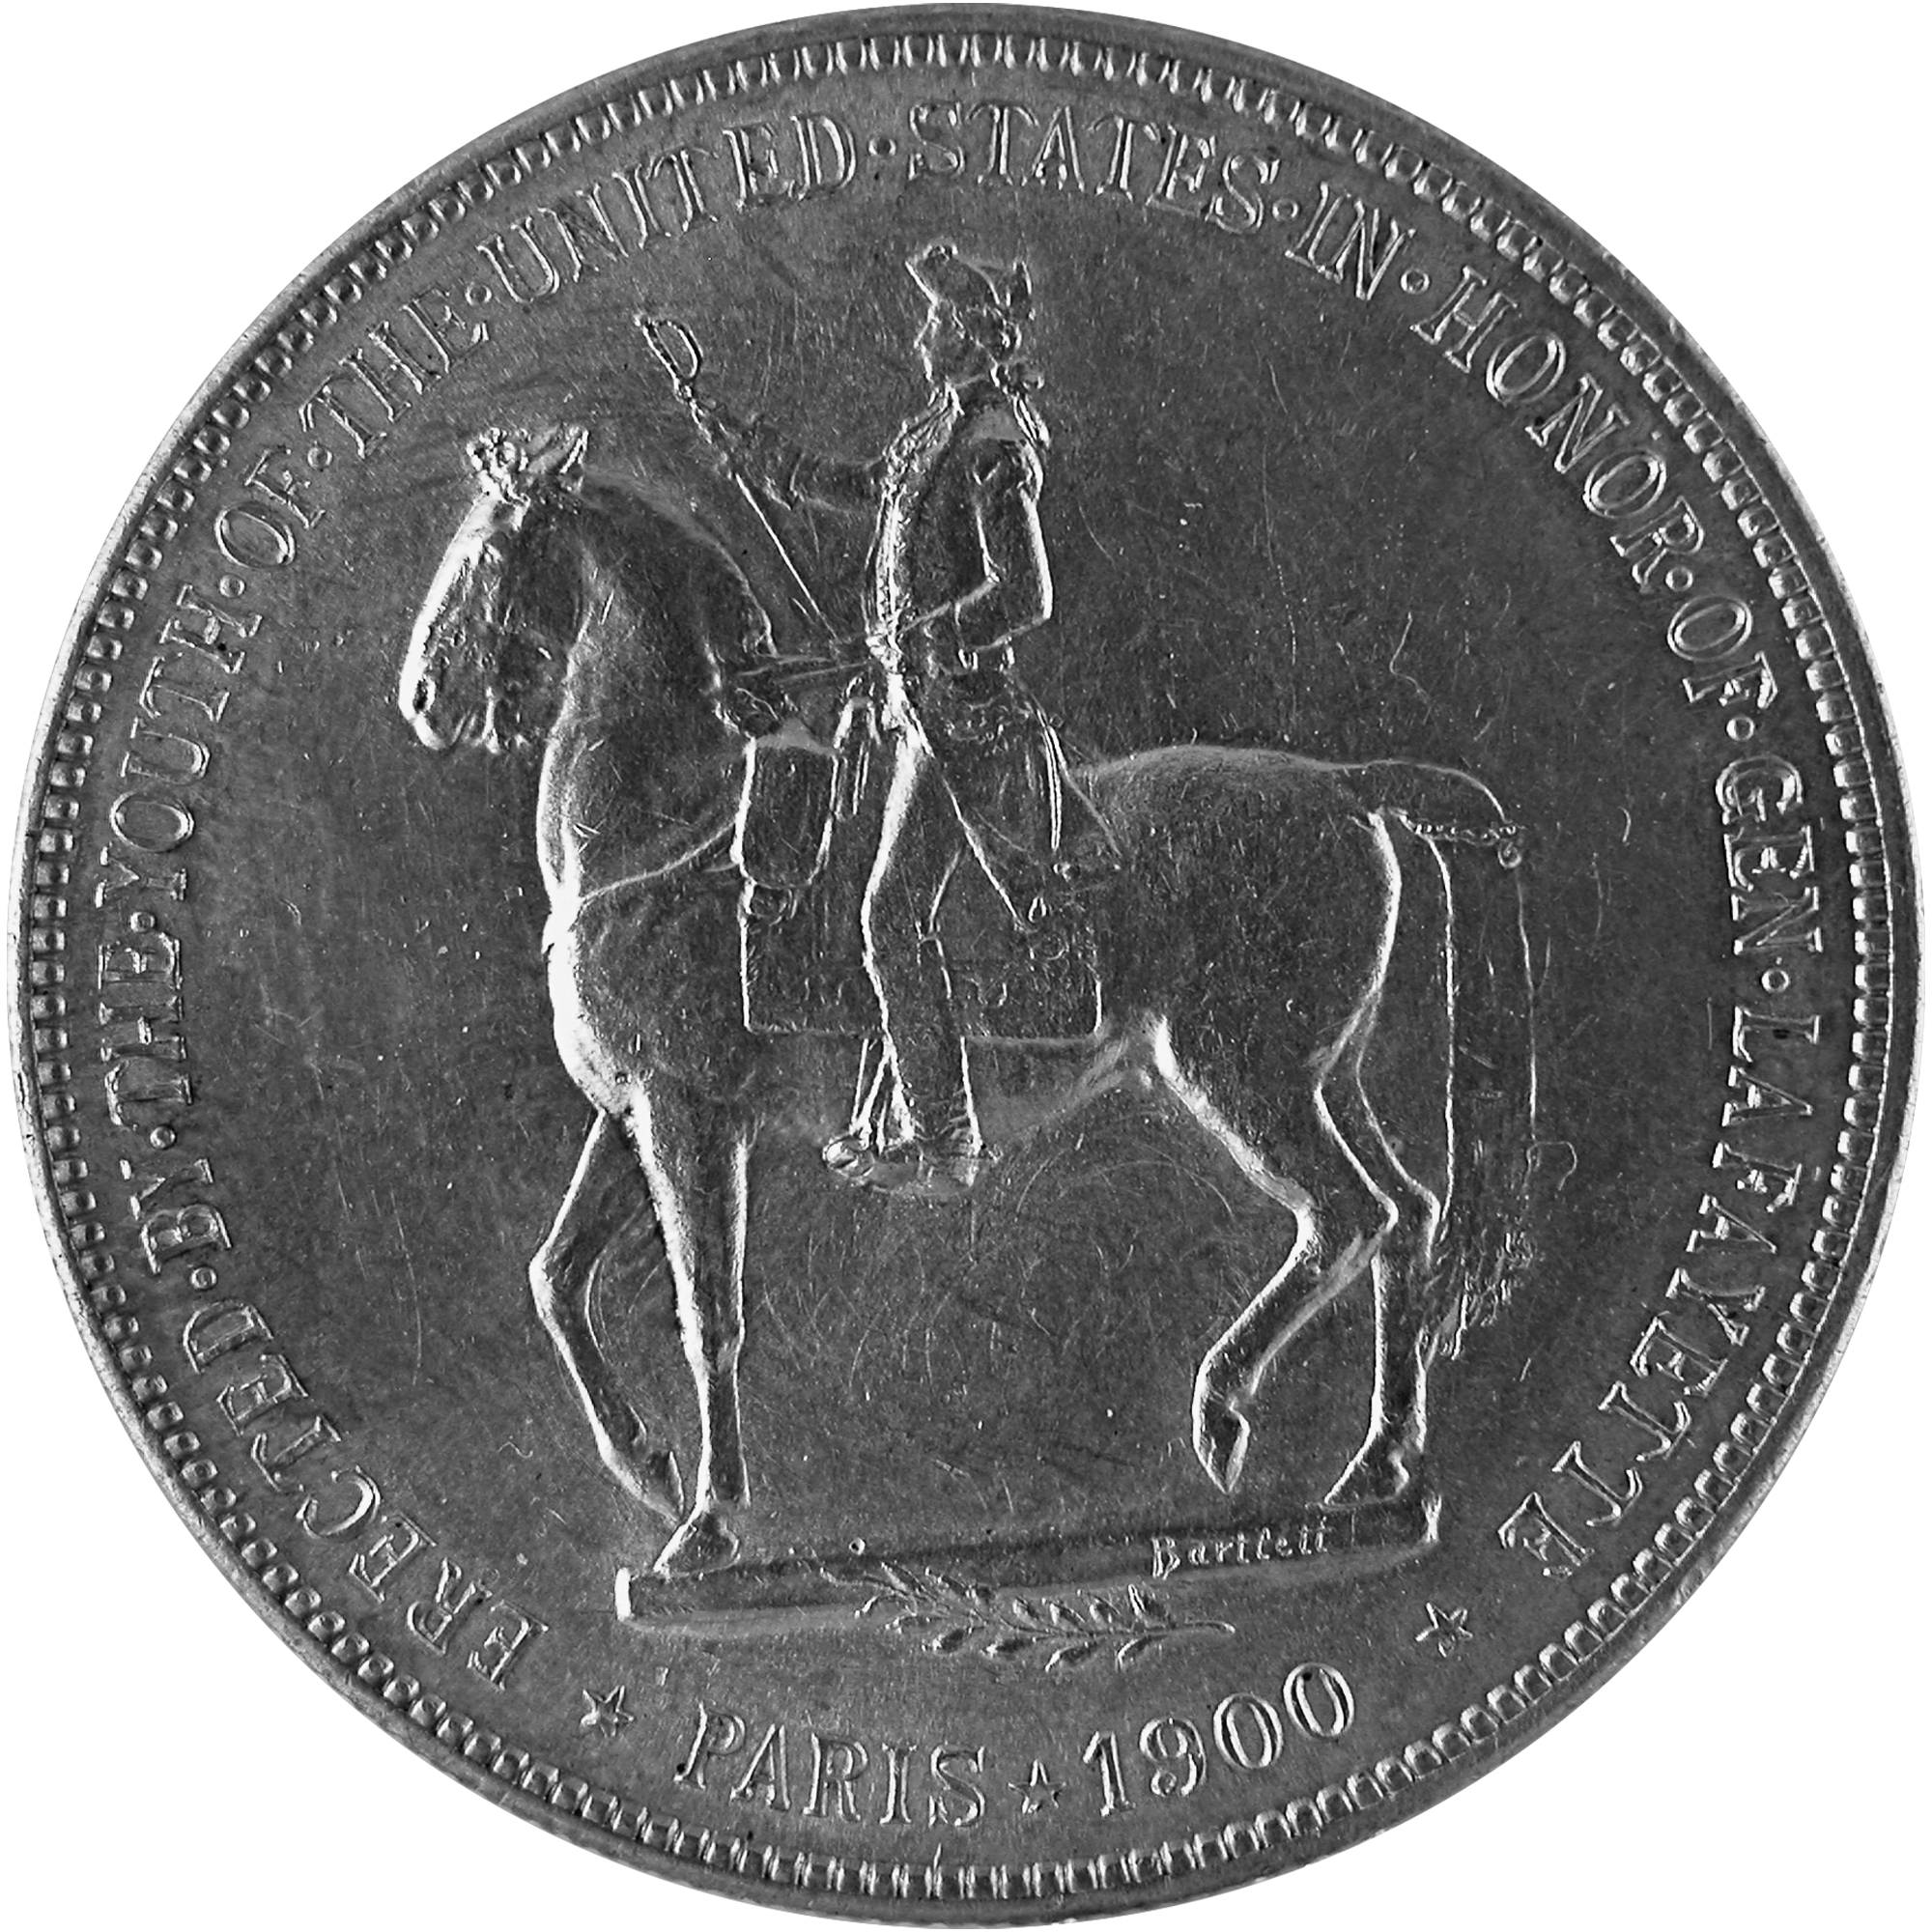 1900 General Lafayette Commemorative Silver One Dollar Coin Reverse